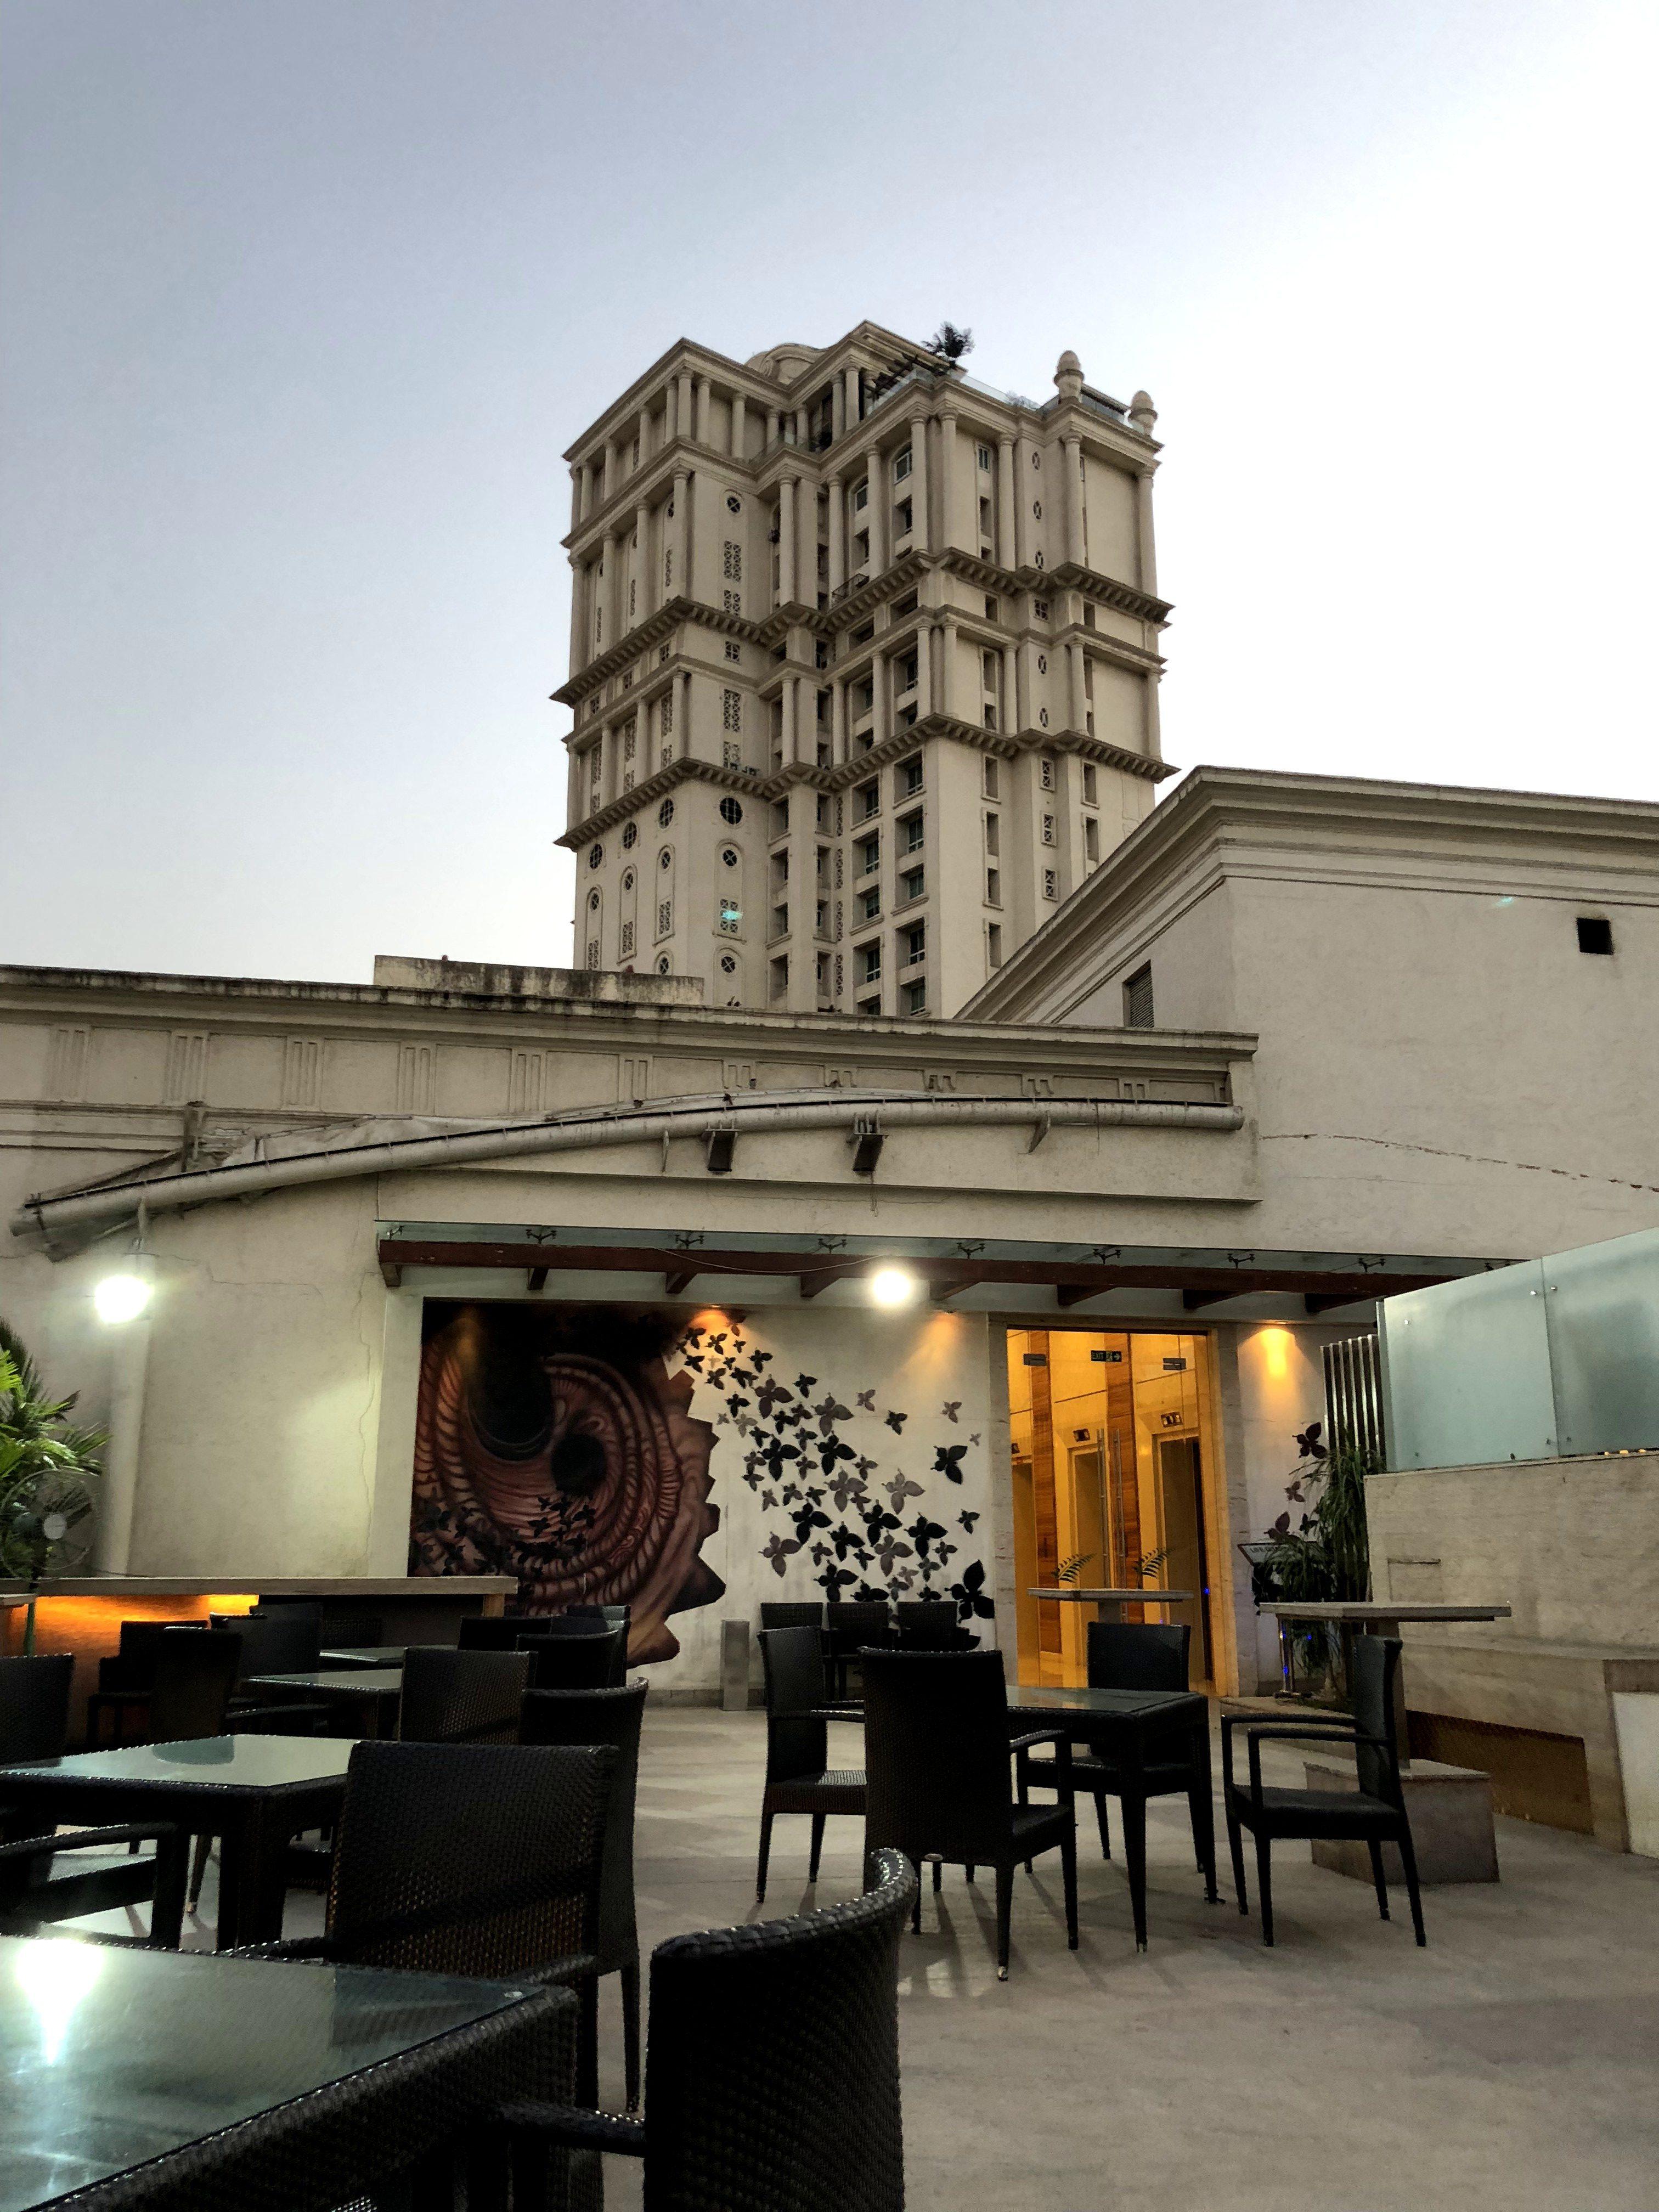 Meluha - the Fern Hotel